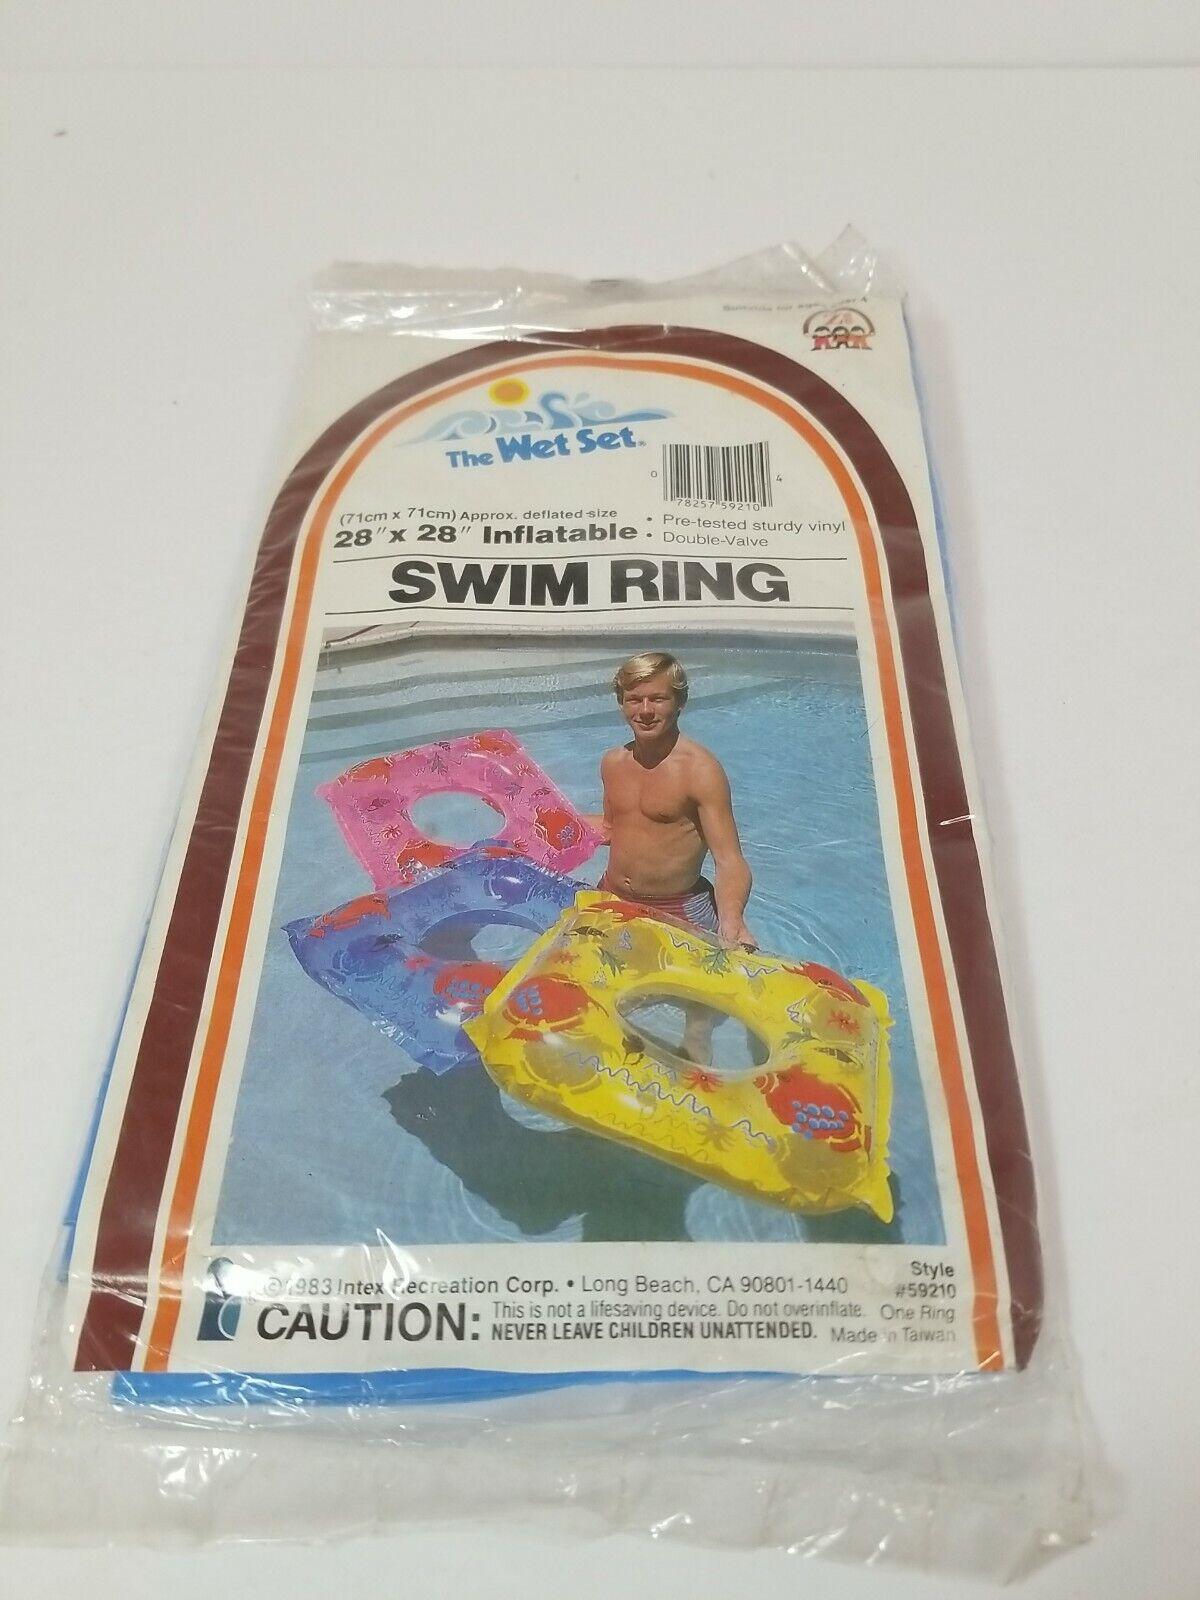 Vtg Sealed 1983 Intex The Wet Set Vinyl Inflatable Swim Ring Double Valve - Blue